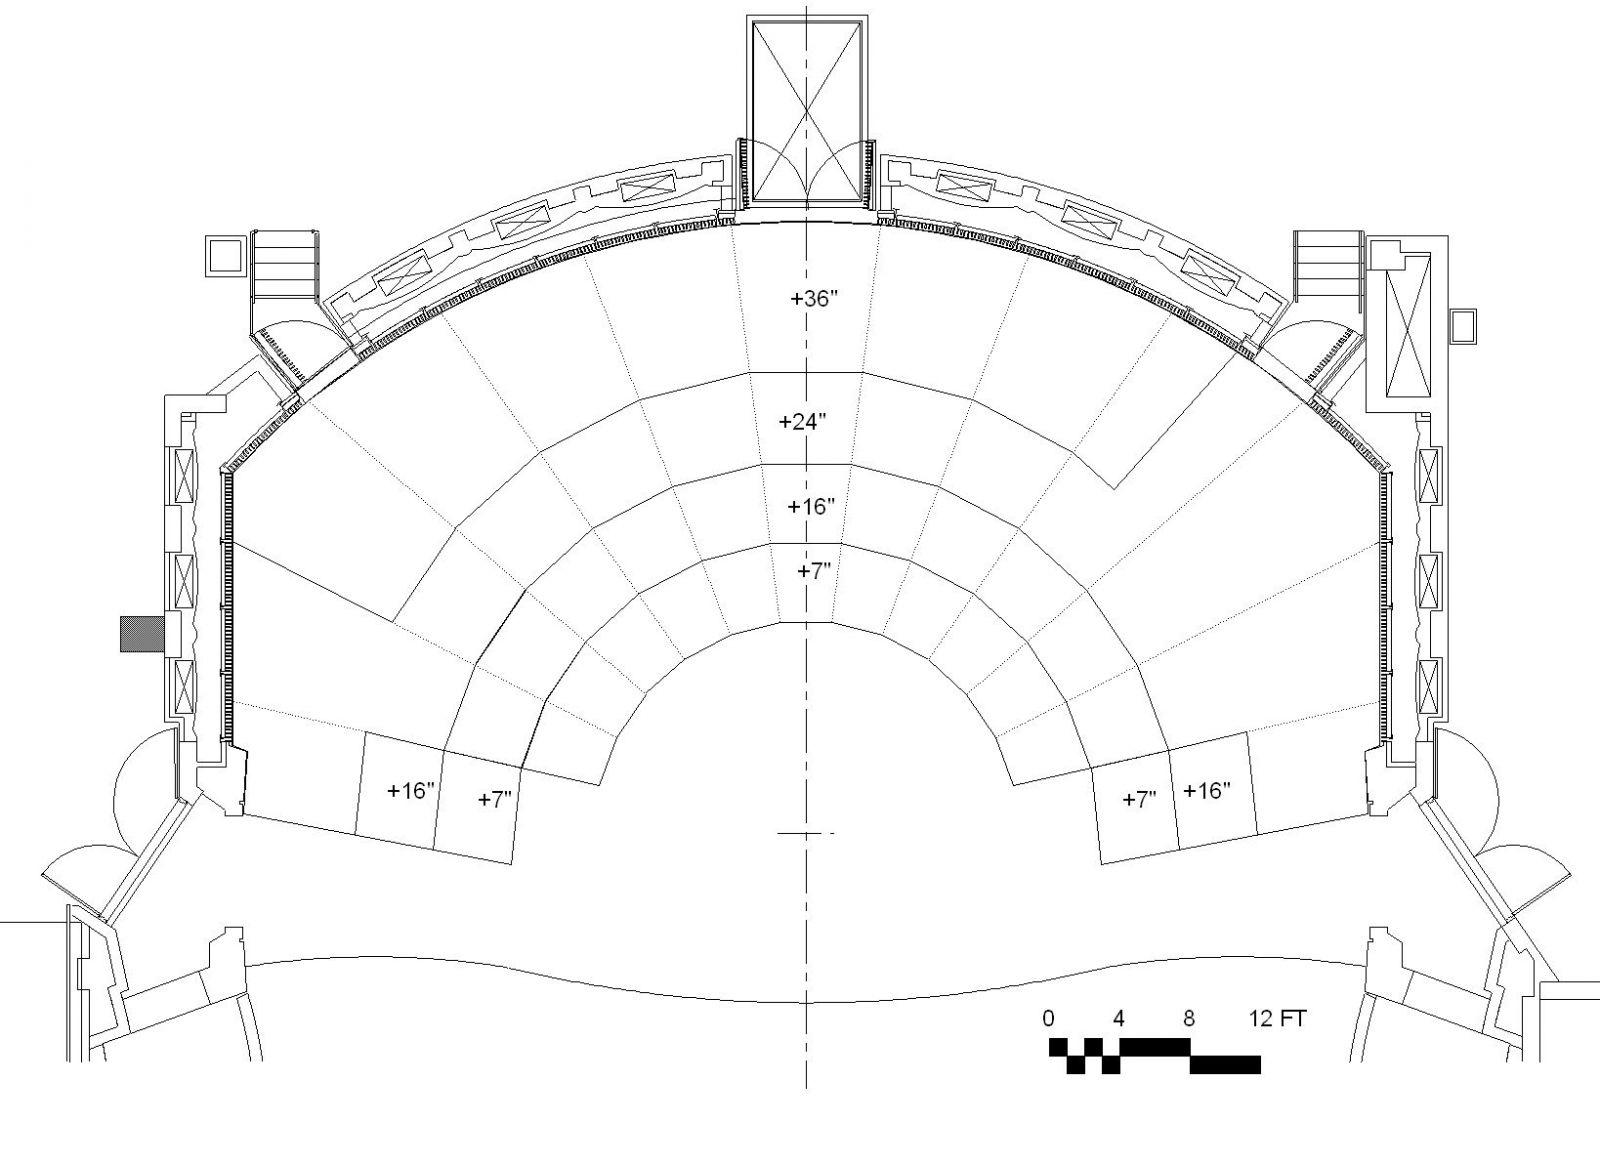 Dekelboum Concert Hall Technical Specifications